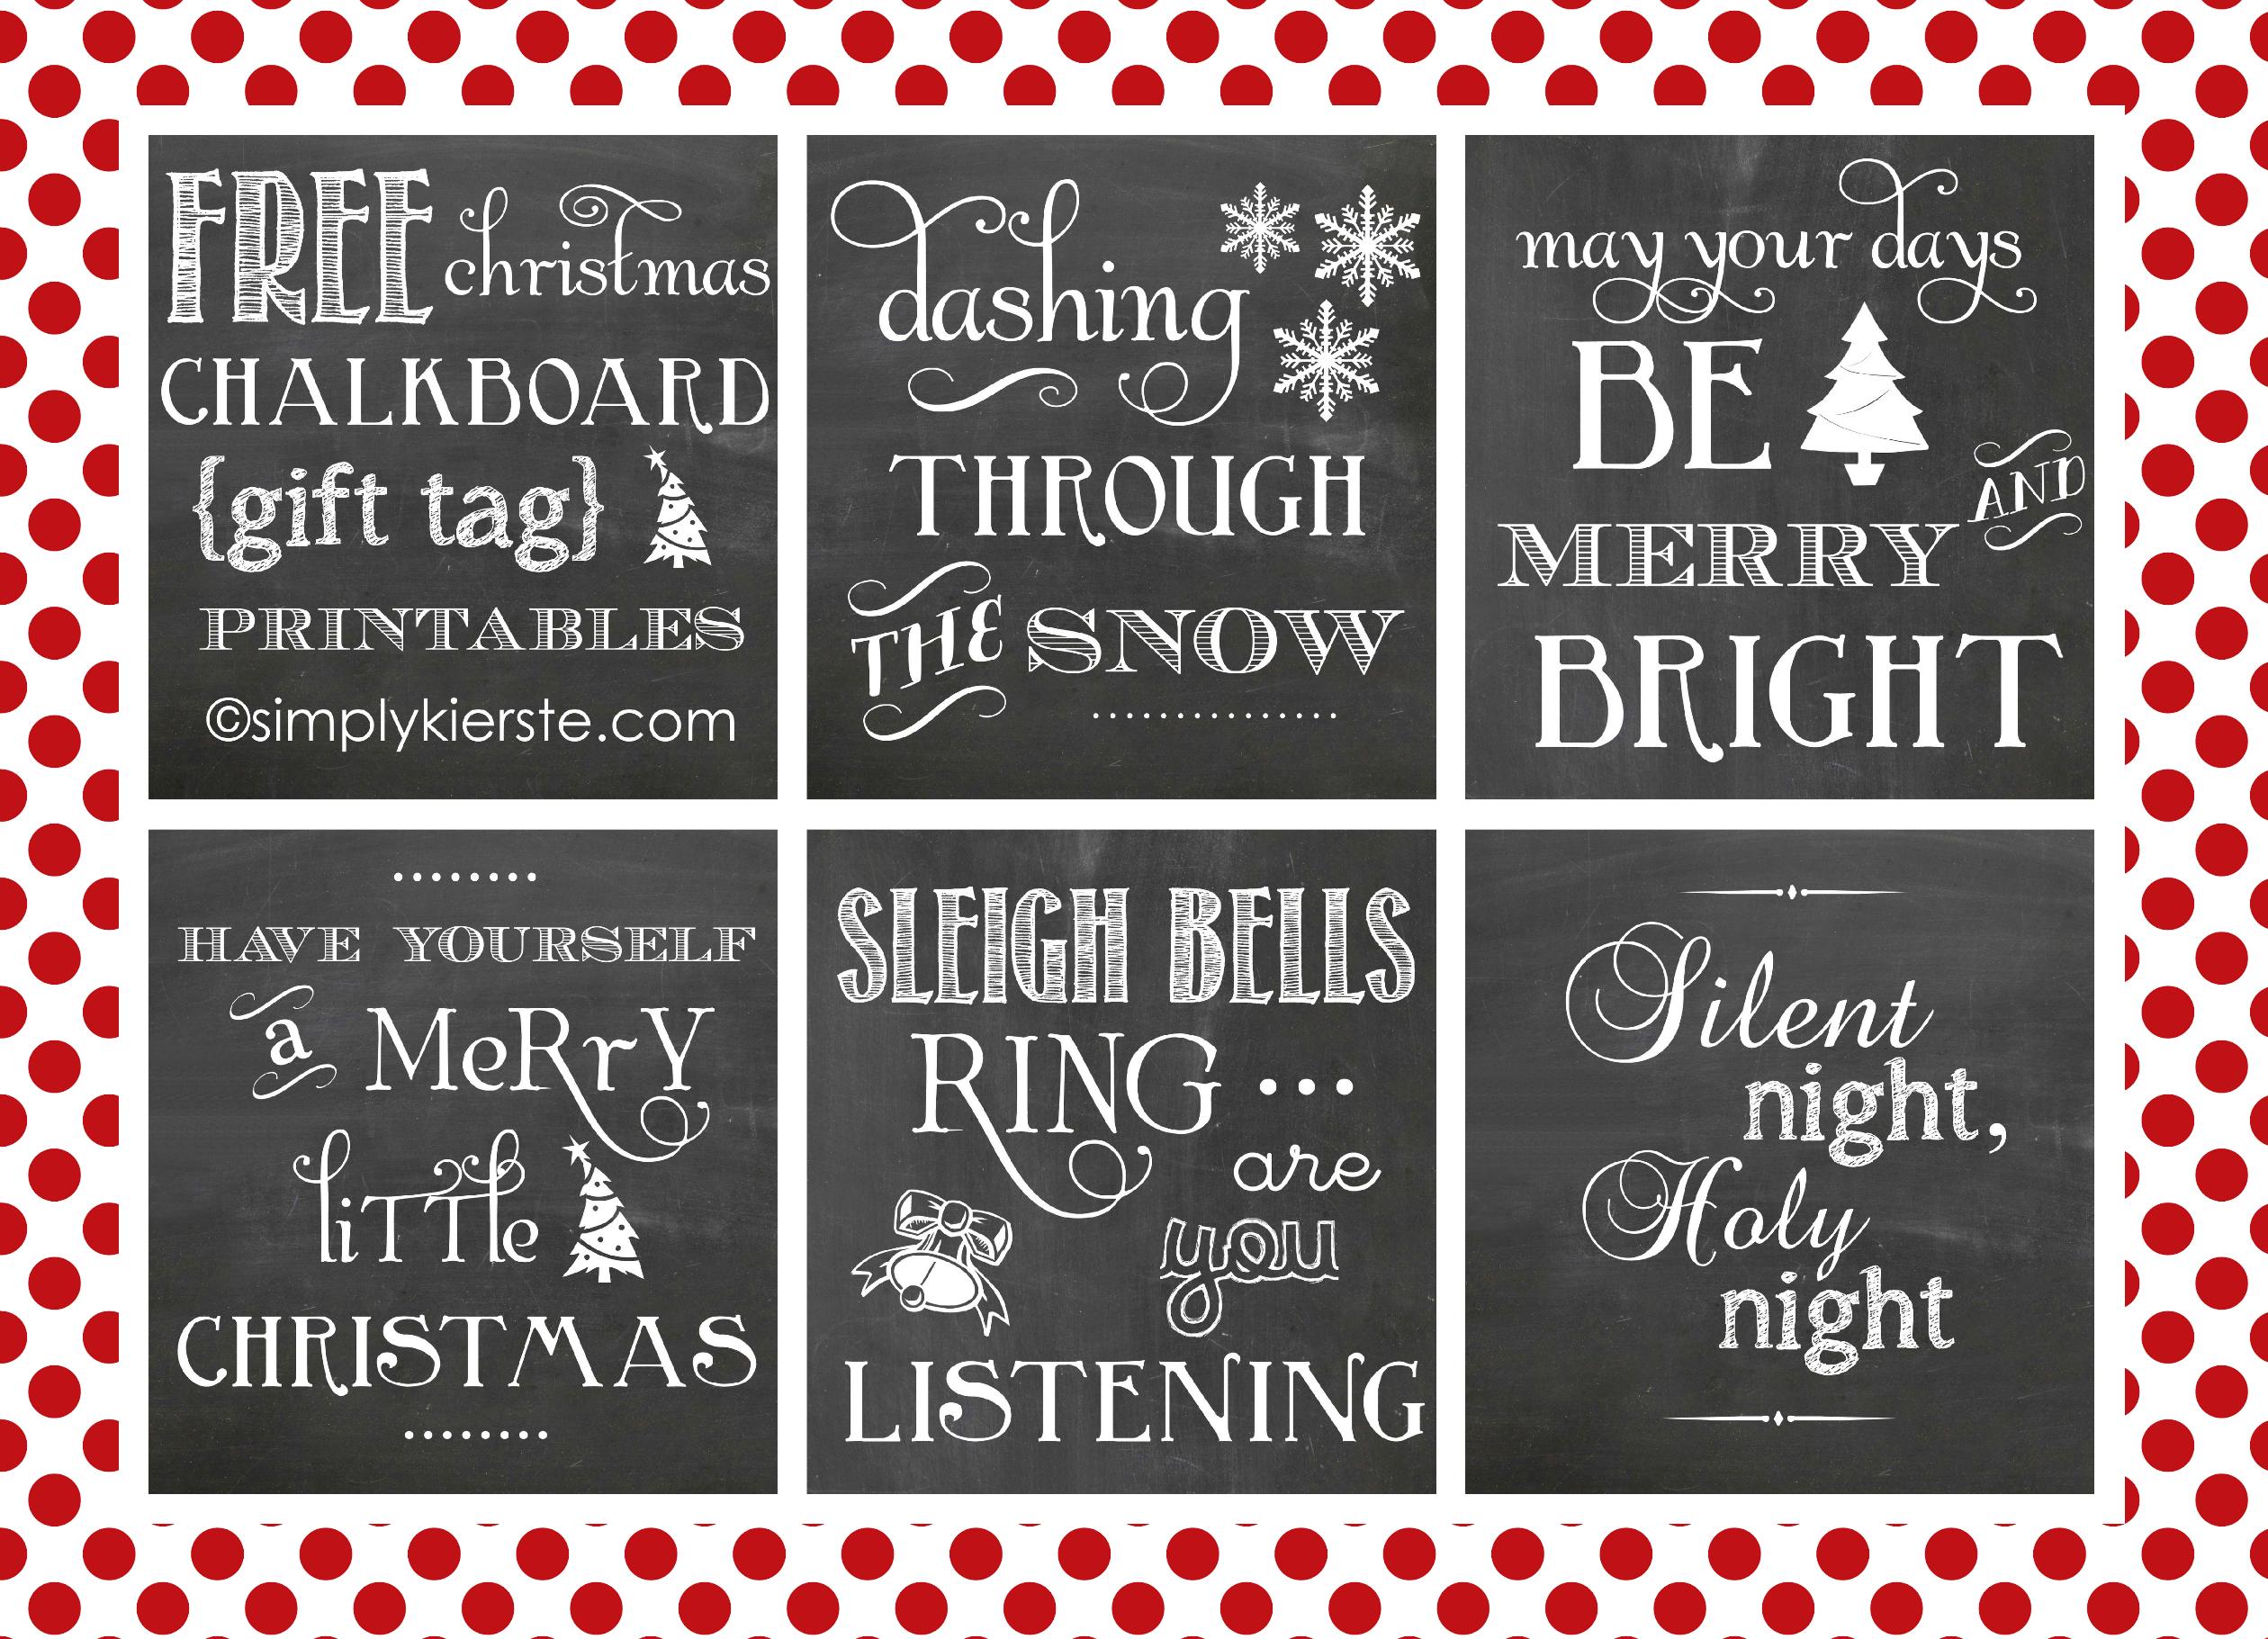 Christmas Chalkboard Gift Tag Printables - Simplykierstecom